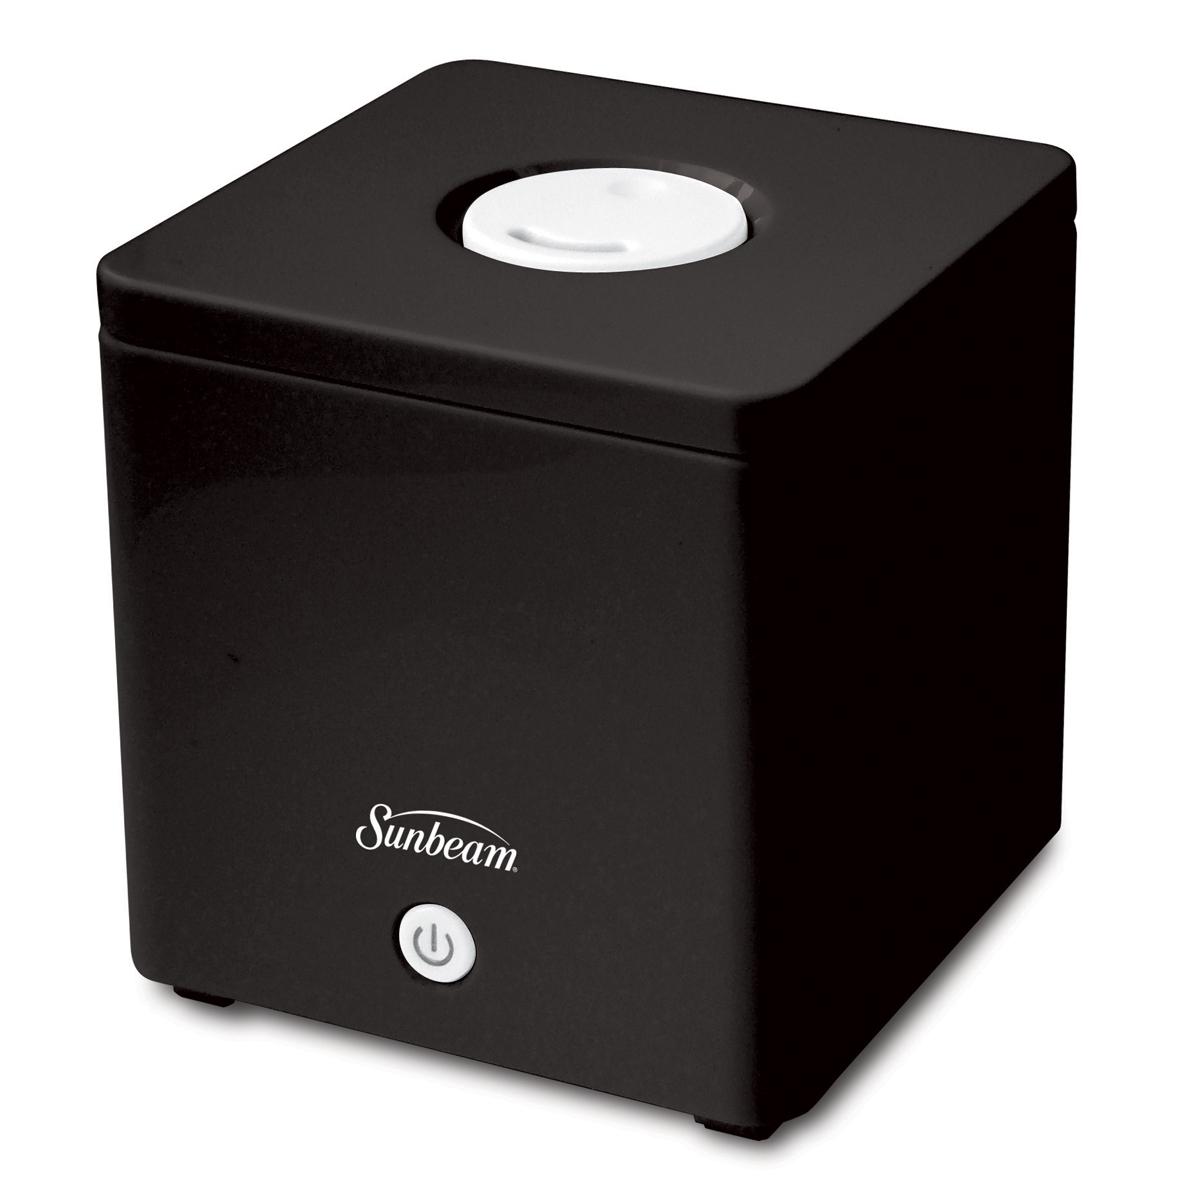 Personal Ultrasonic Humidifier Black SUL400 BLK CN Sunbeam® Canada #211A1A